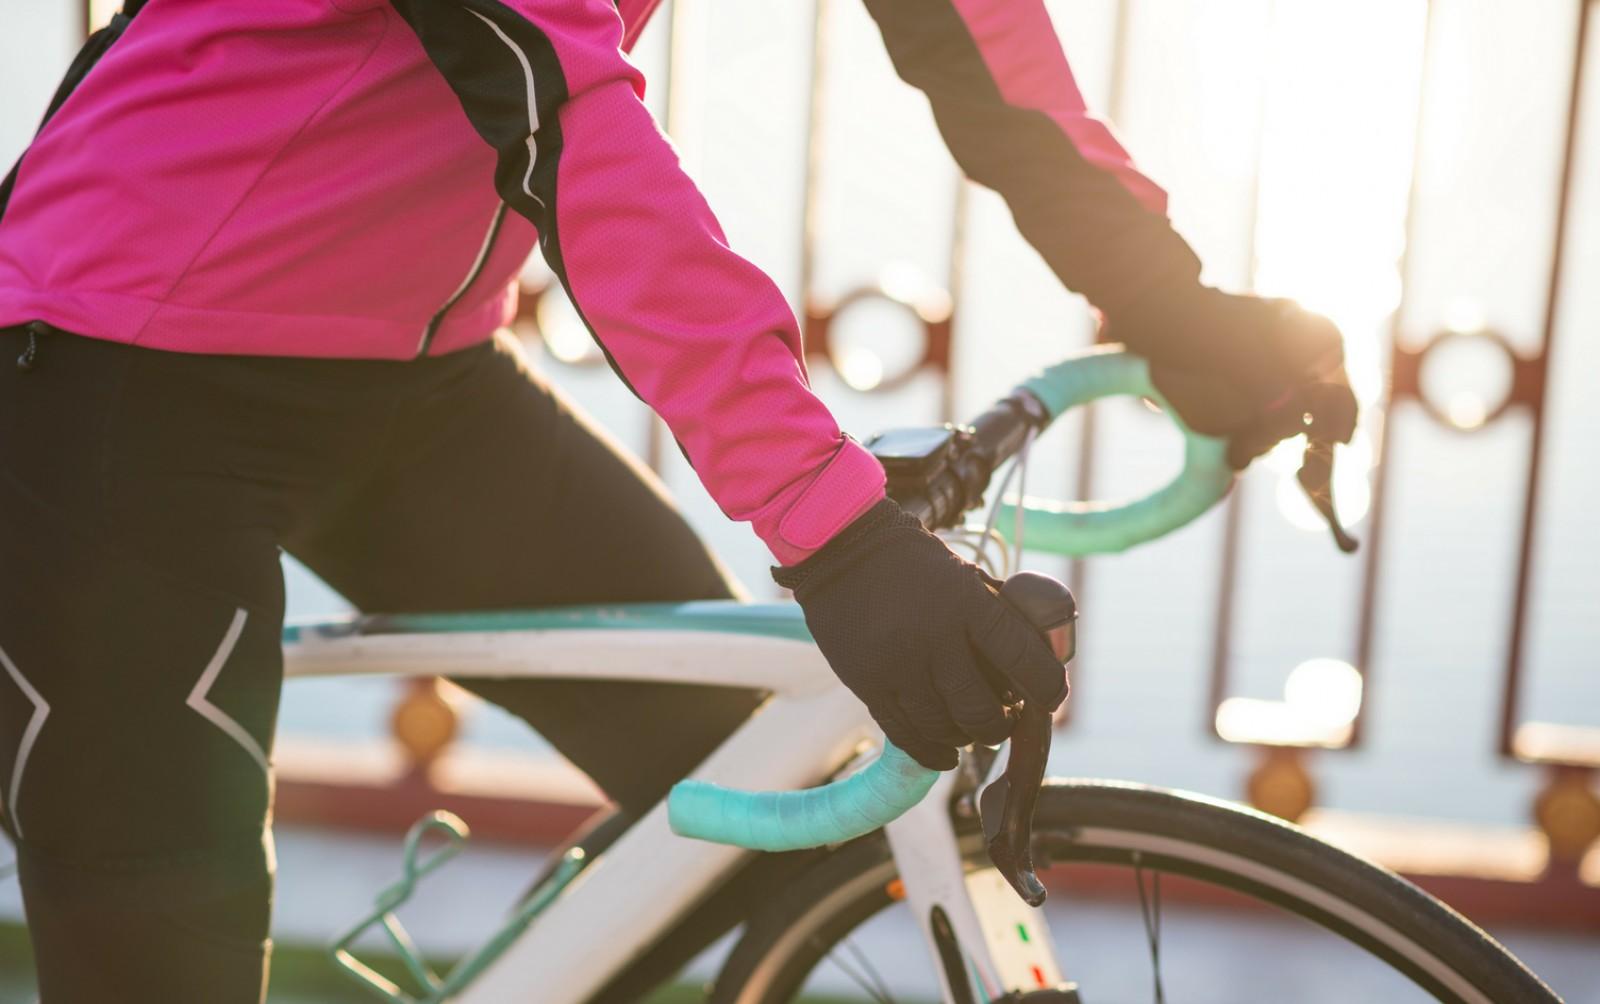 pies-manos-fríos-ciclismo/